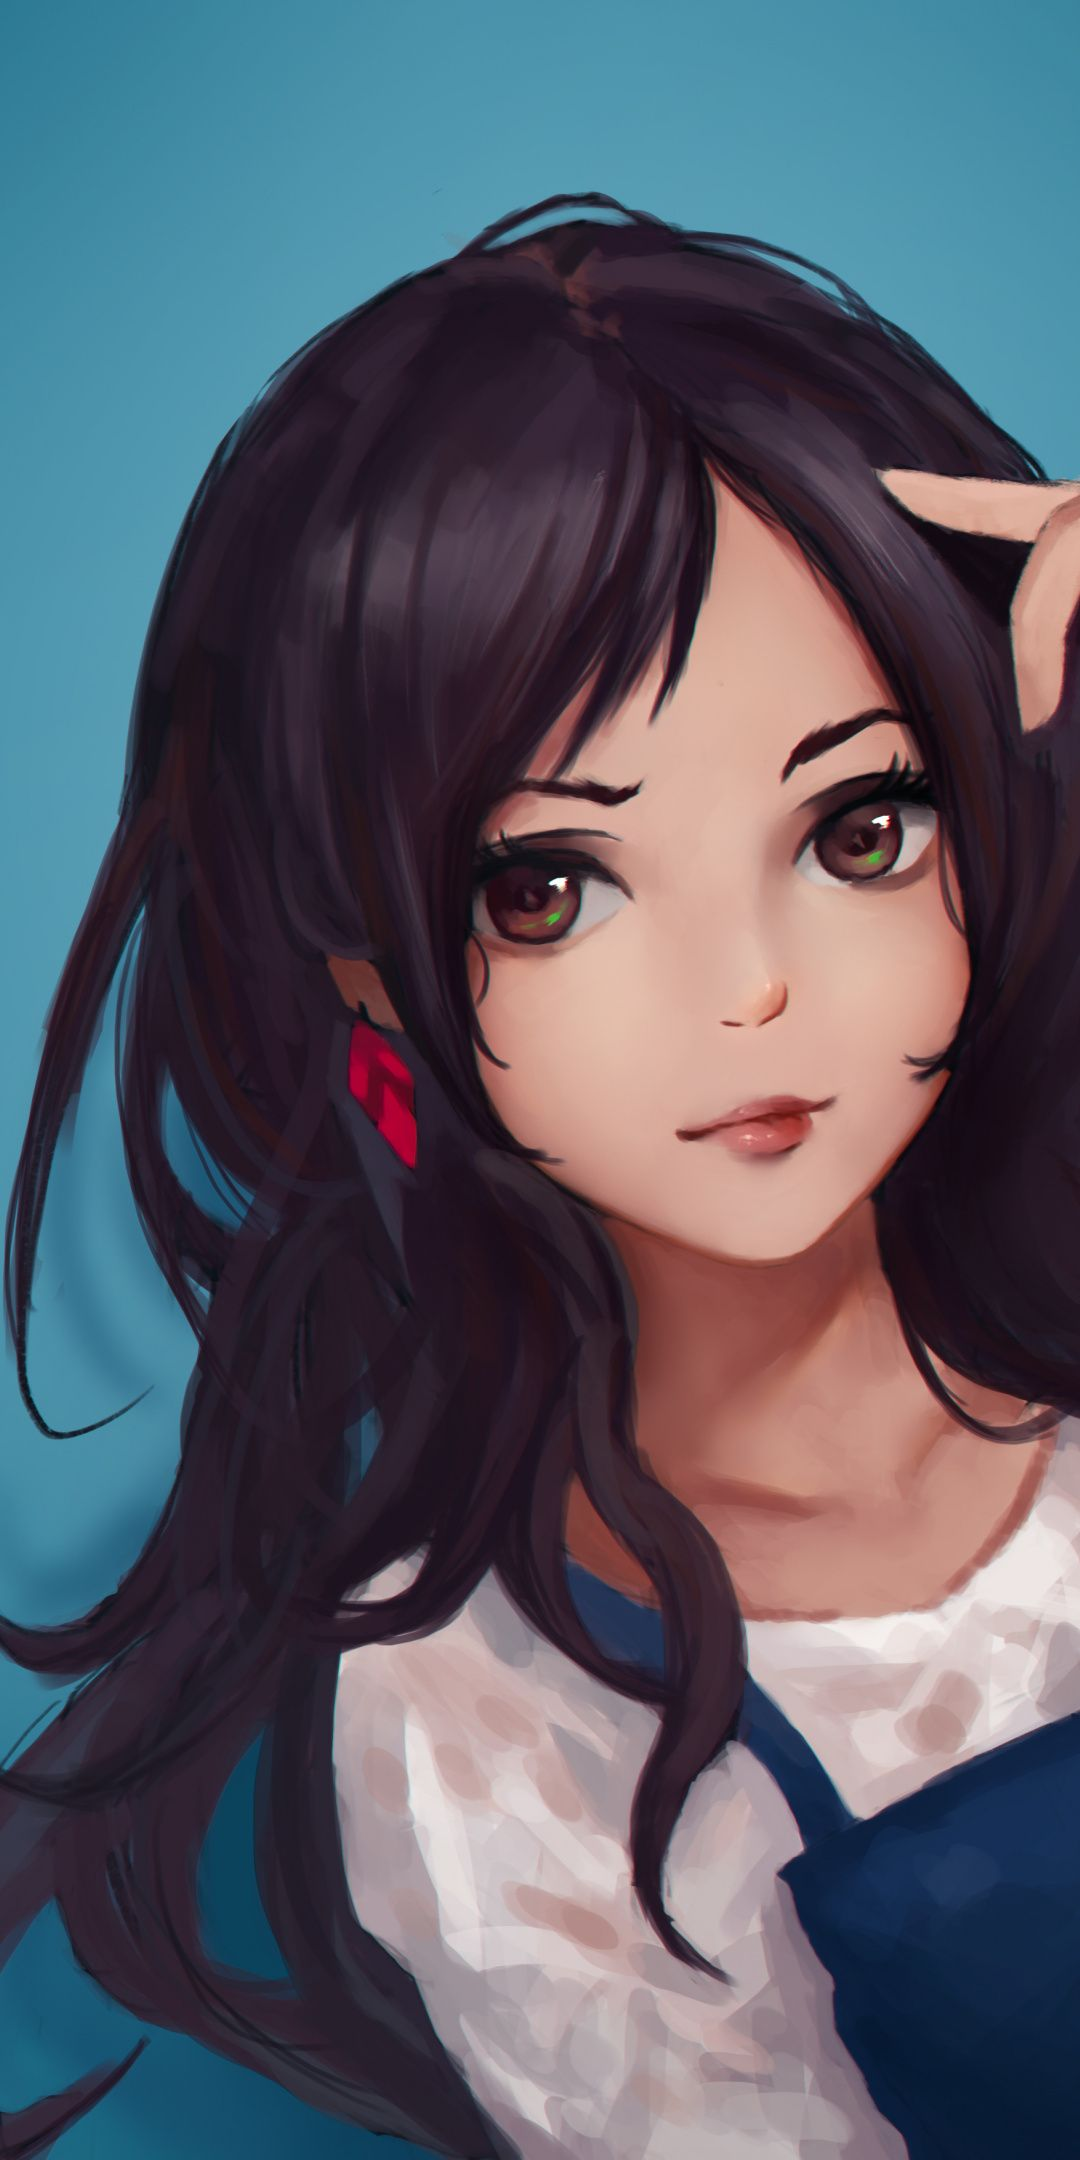 Beautiful Cute Anime Girls Wallpapers - Wallpaper Cave